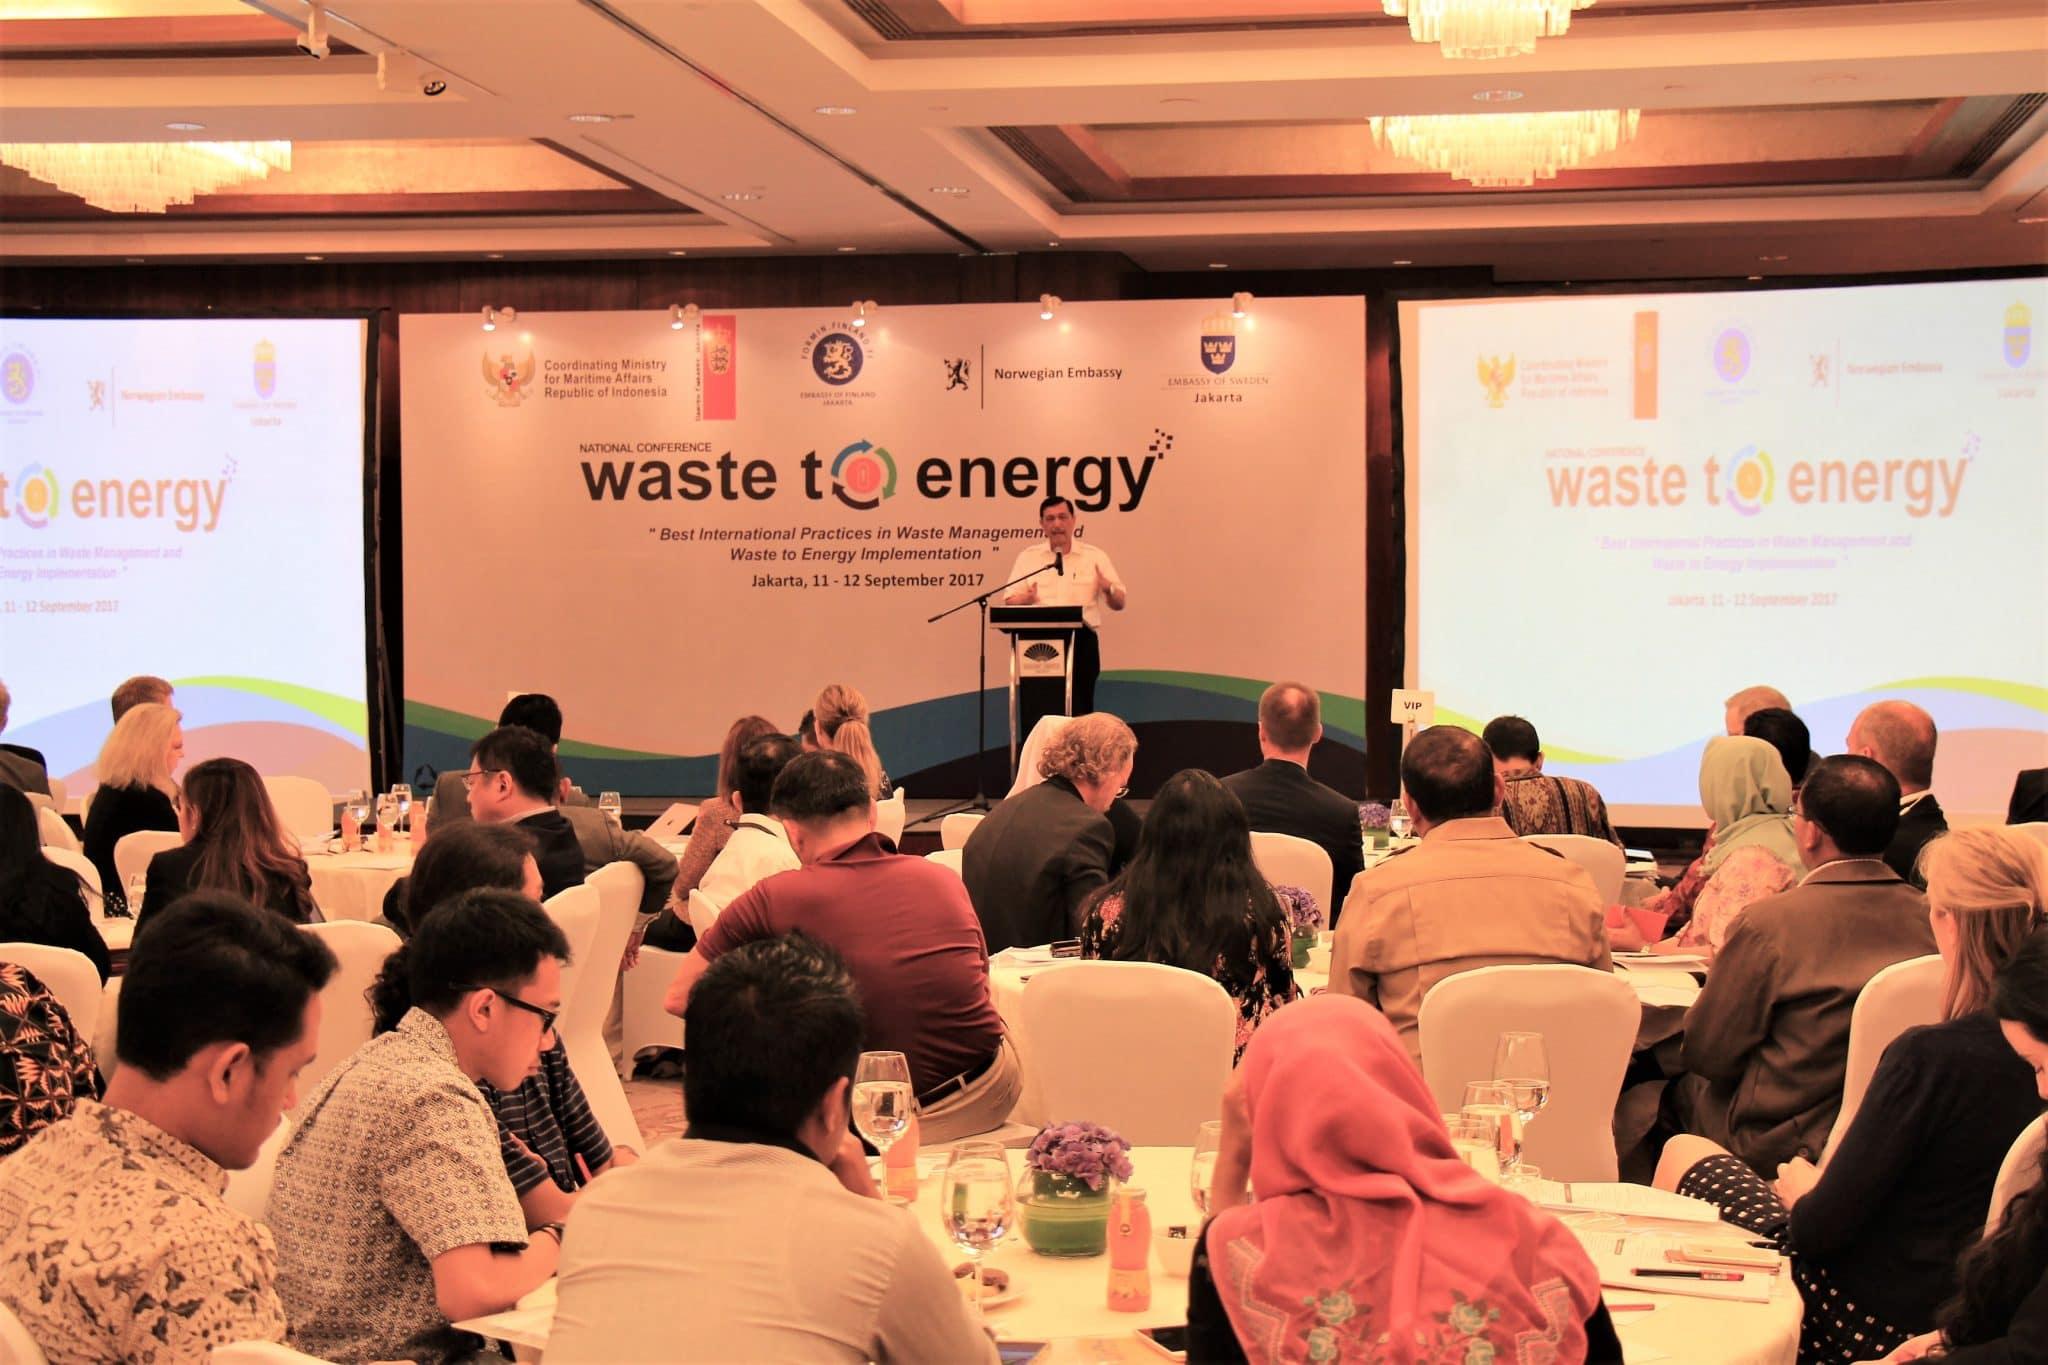 Menko Luhut Membuka National Conference on Waste to Energy di Hotel Mandarin